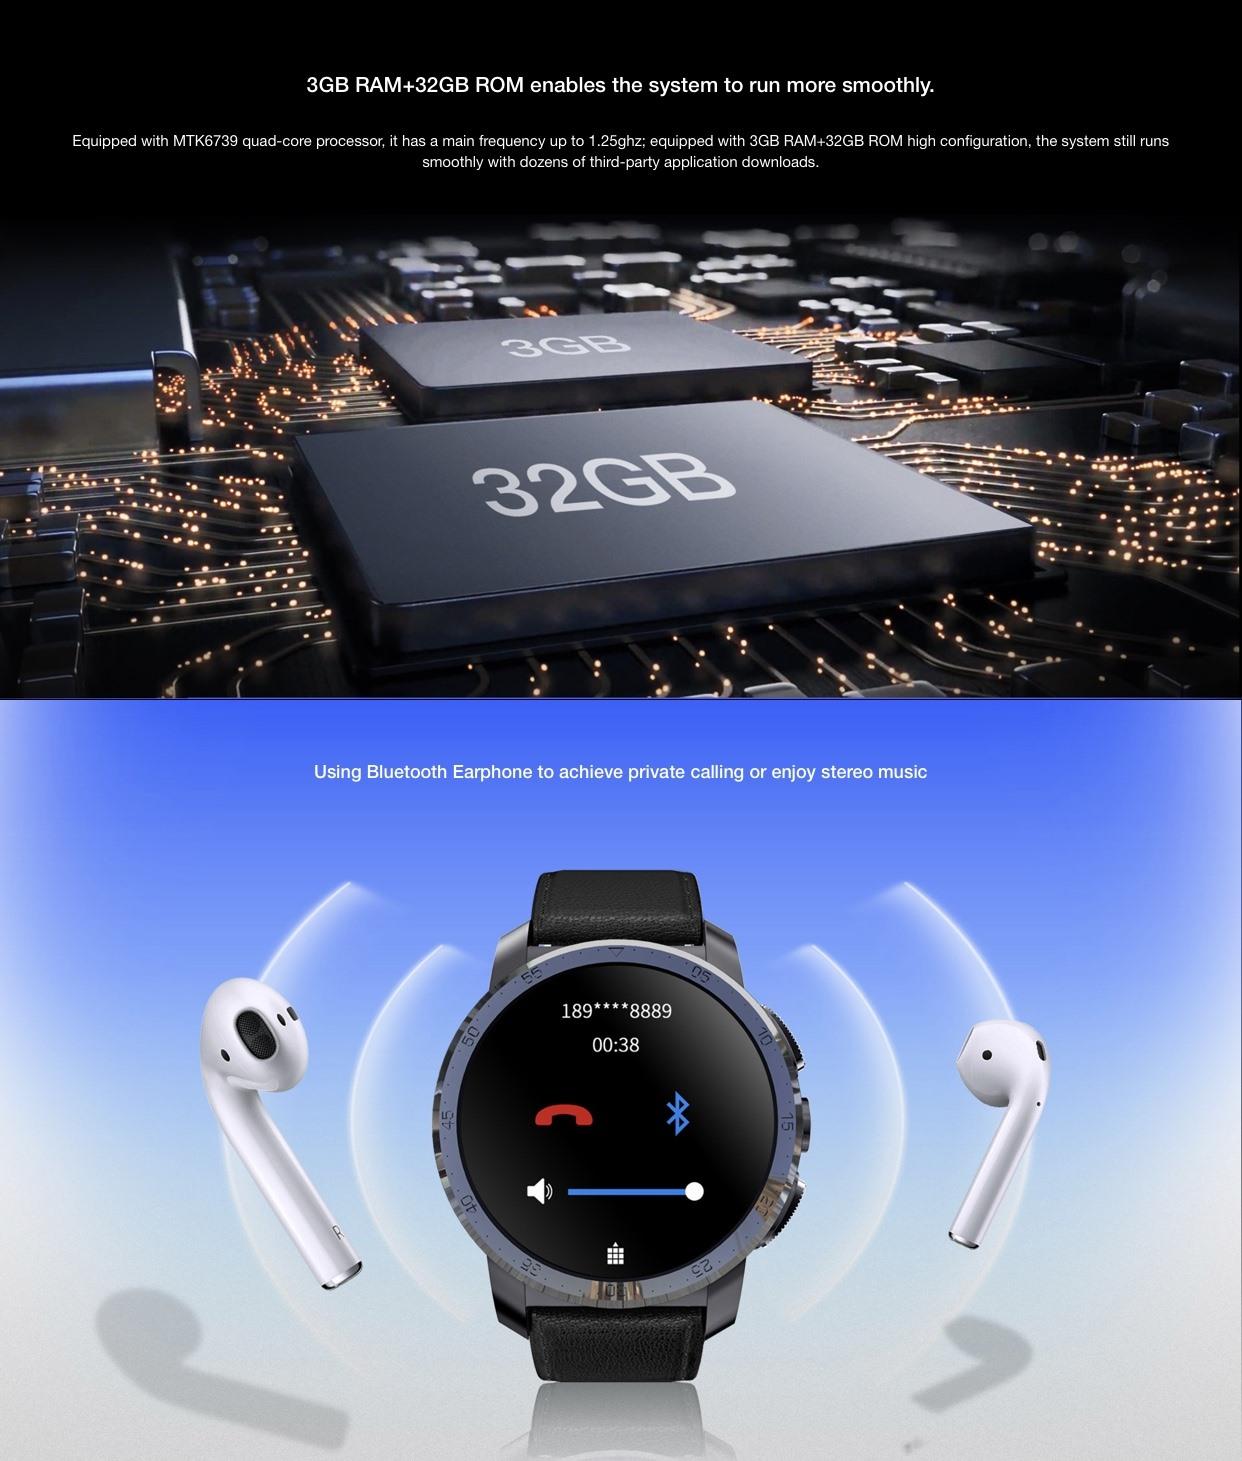 Kospet Optimus Pro 3GB 32GB Çift İşlemcili 4G Akıllı Saat+ Akıllı Telefon